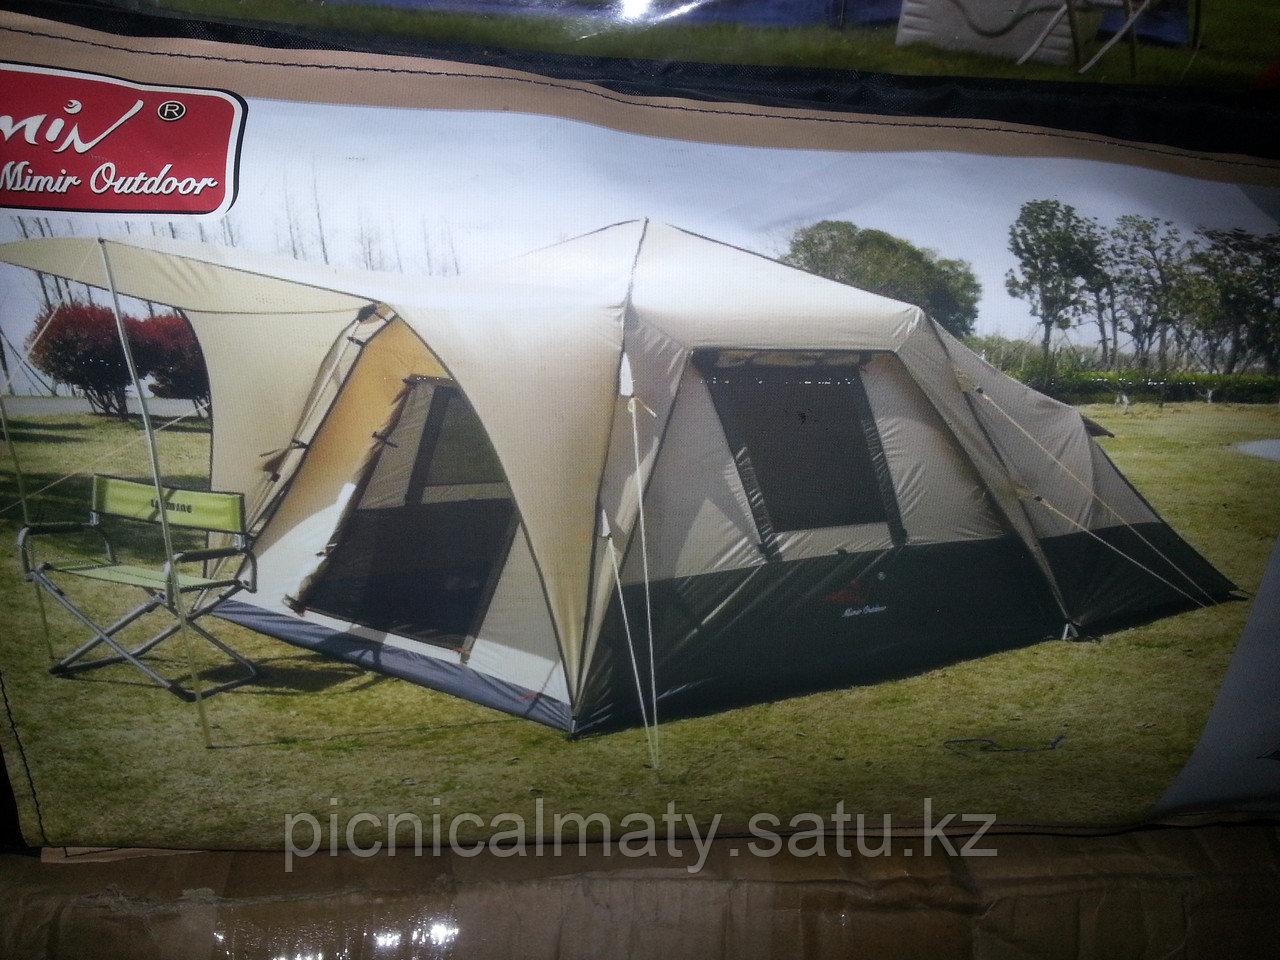 Палатка Mimir Outdoor Traveller 6 CV Tent X-ART 1836